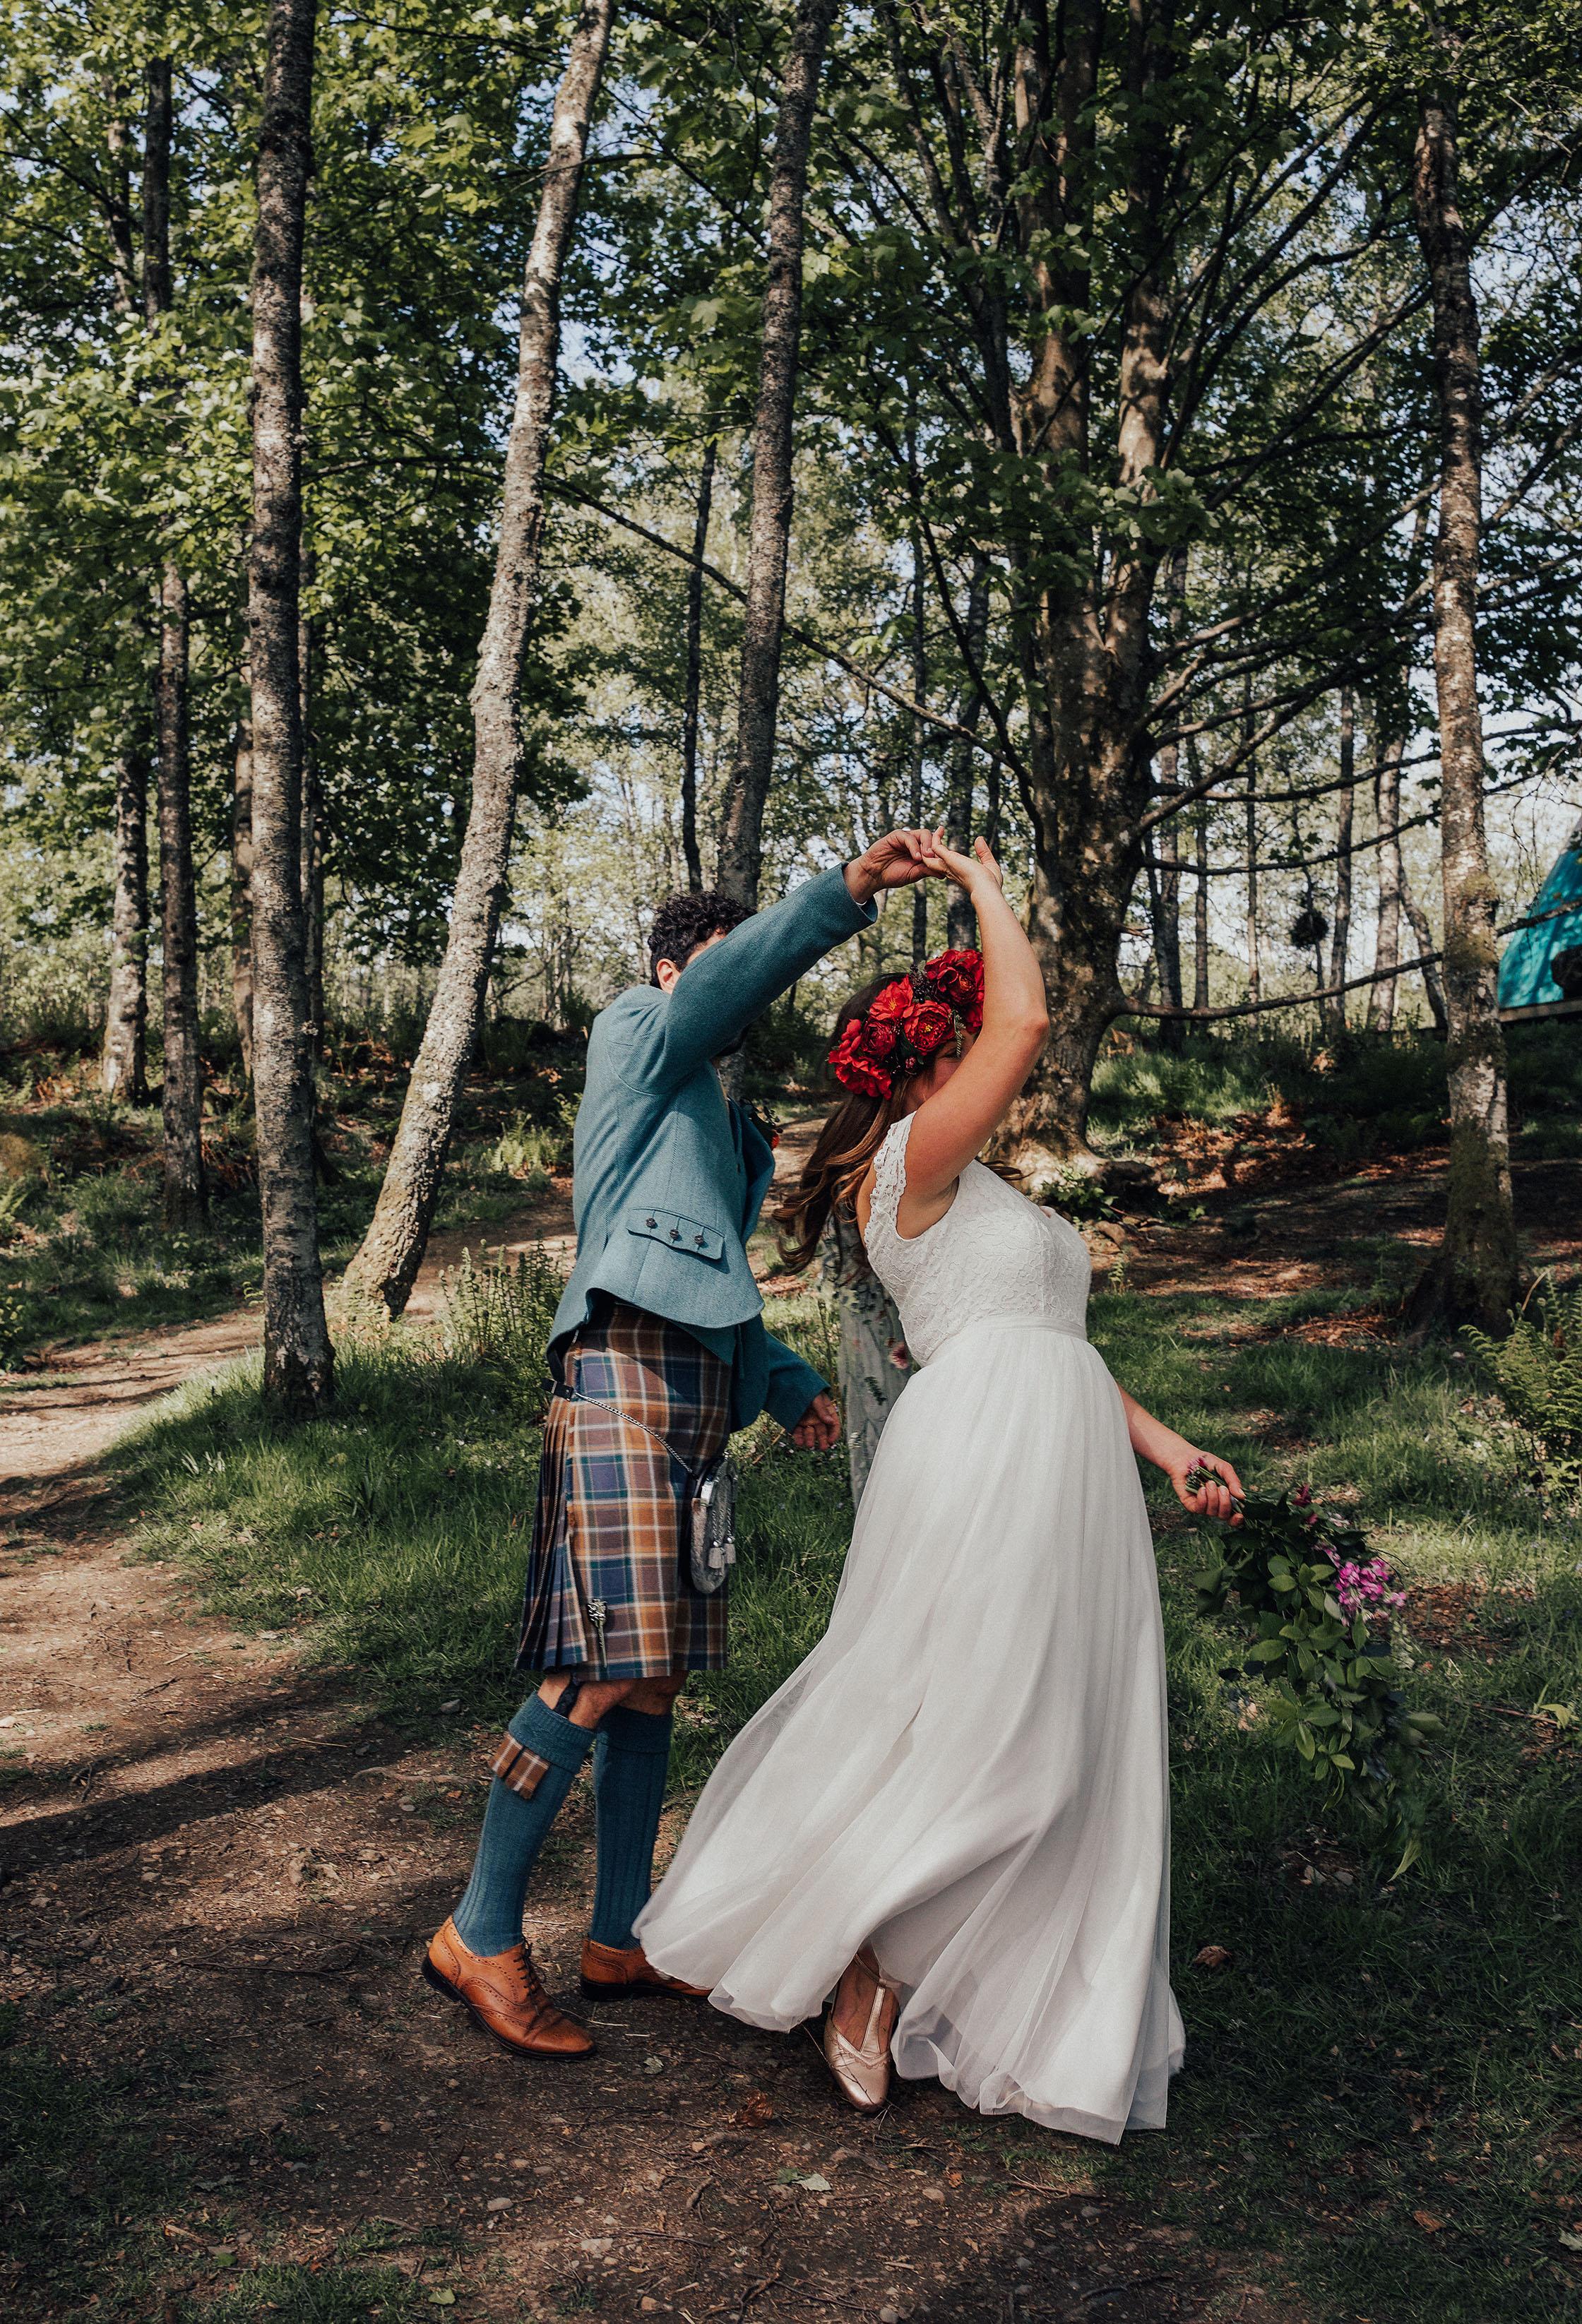 COMRIE_CROFT_WEDDINGS_PJ_PHILLIPS_PHOTOGRAPHY_99.jpg